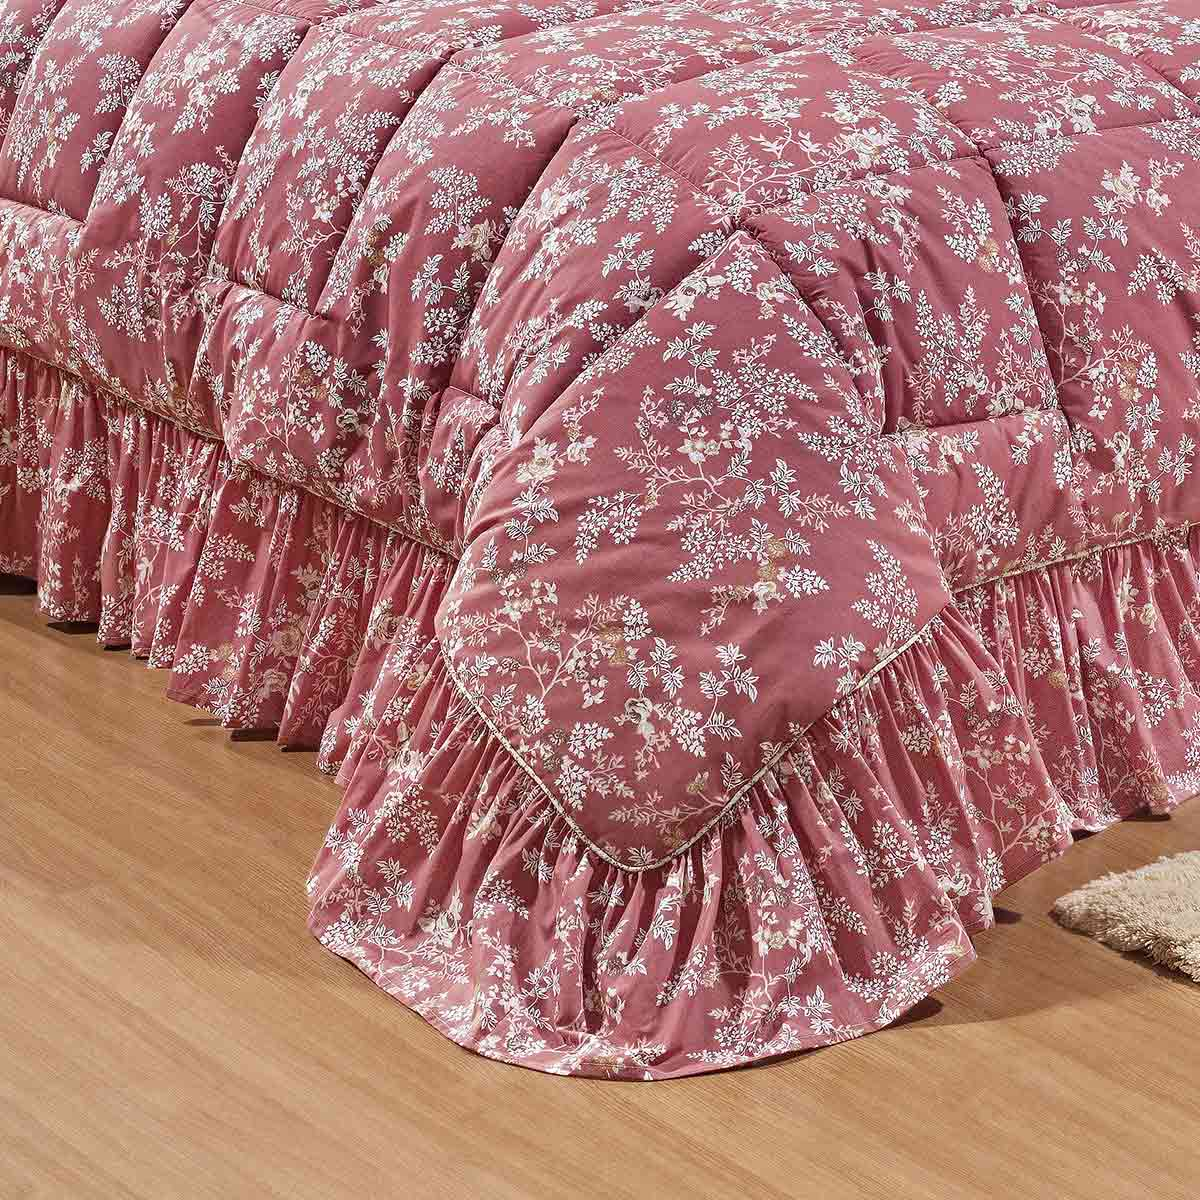 Colcha Casal King Kit Bouquet Percal 200 Fios Florida com 20 peças